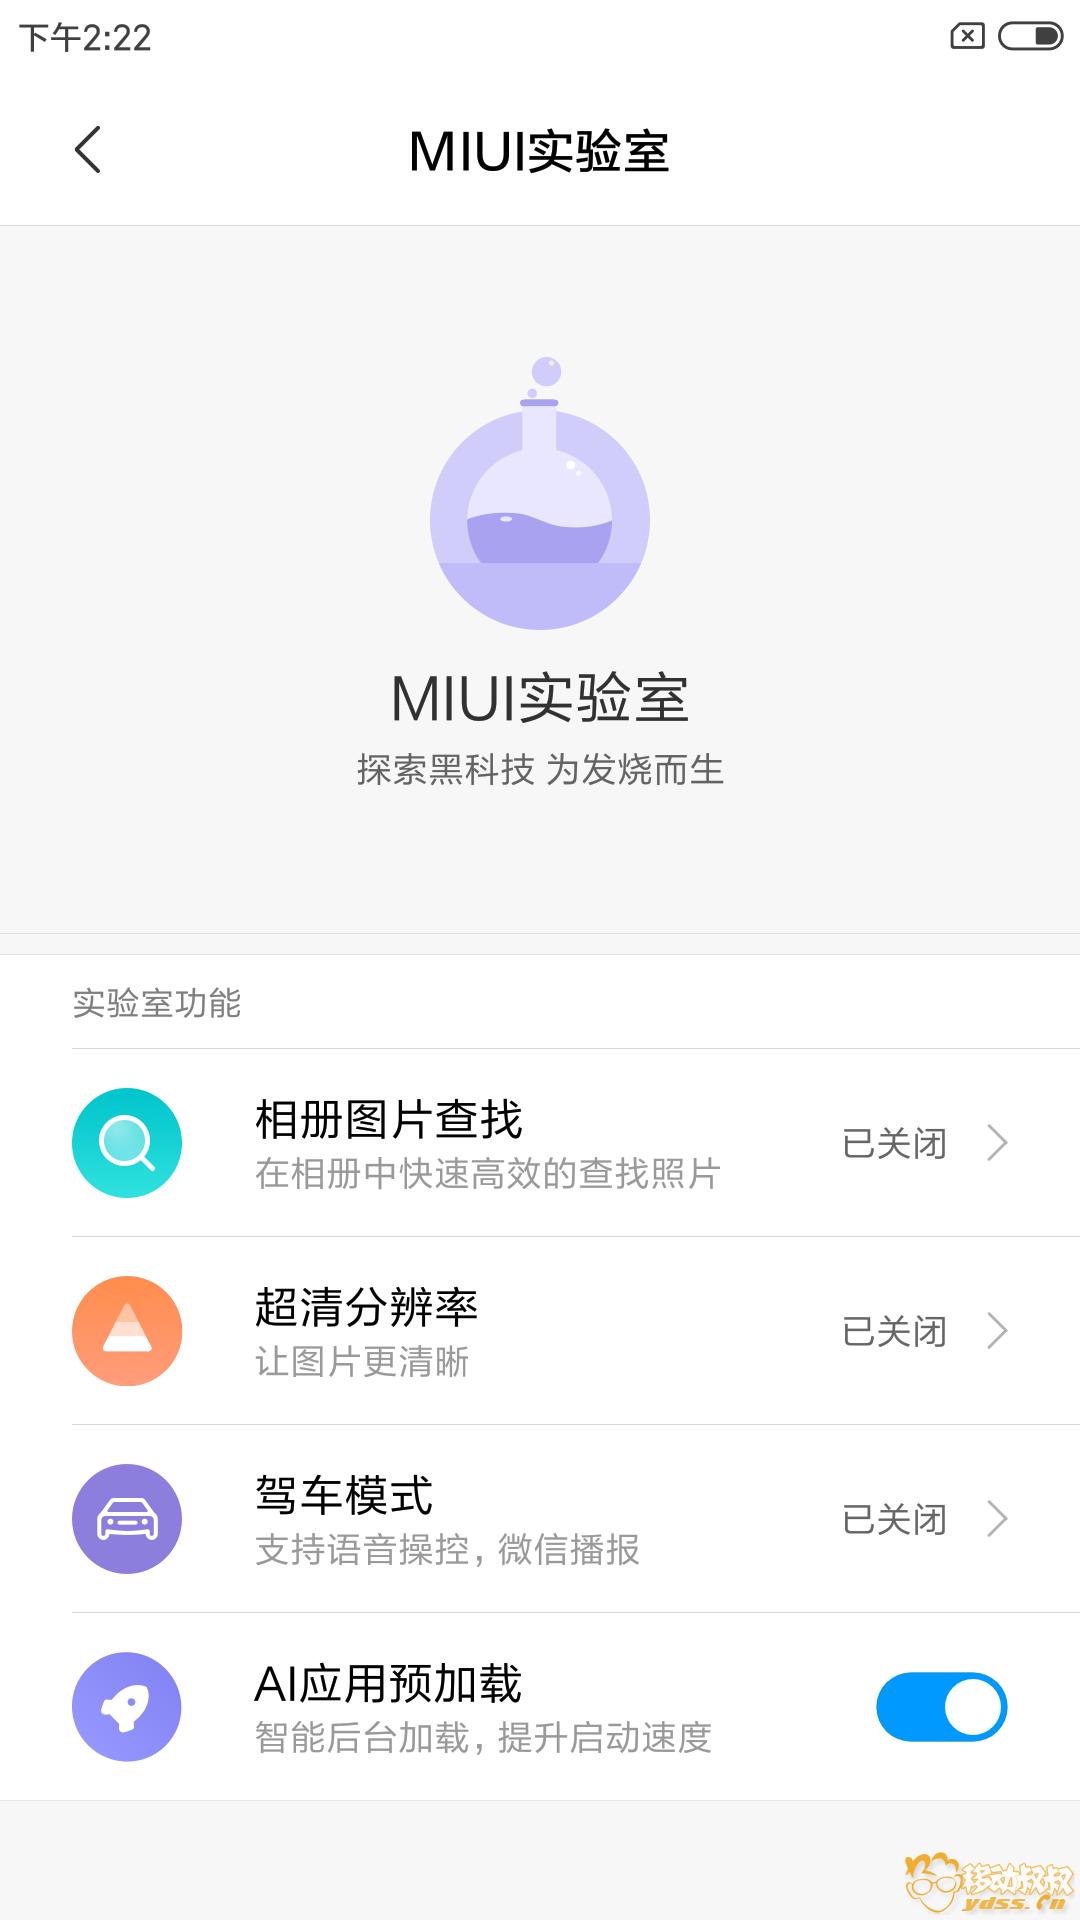 Screenshot_2018-09-24-14-22-46-181_com.android.se.png